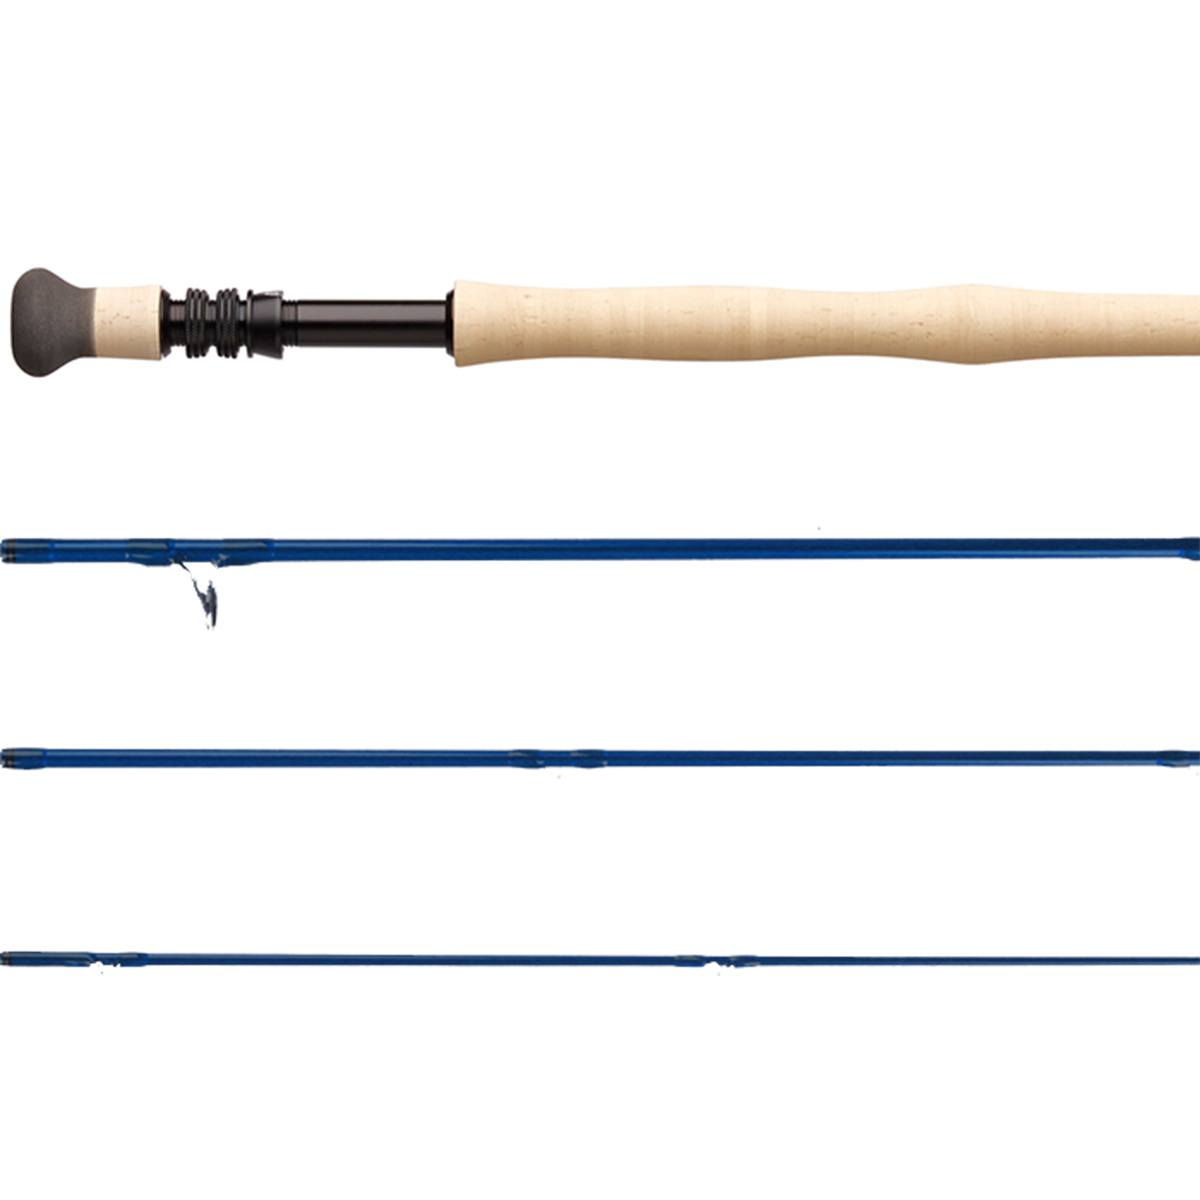 Sage salt fly fishing rods ebay for Ebay fly fishing